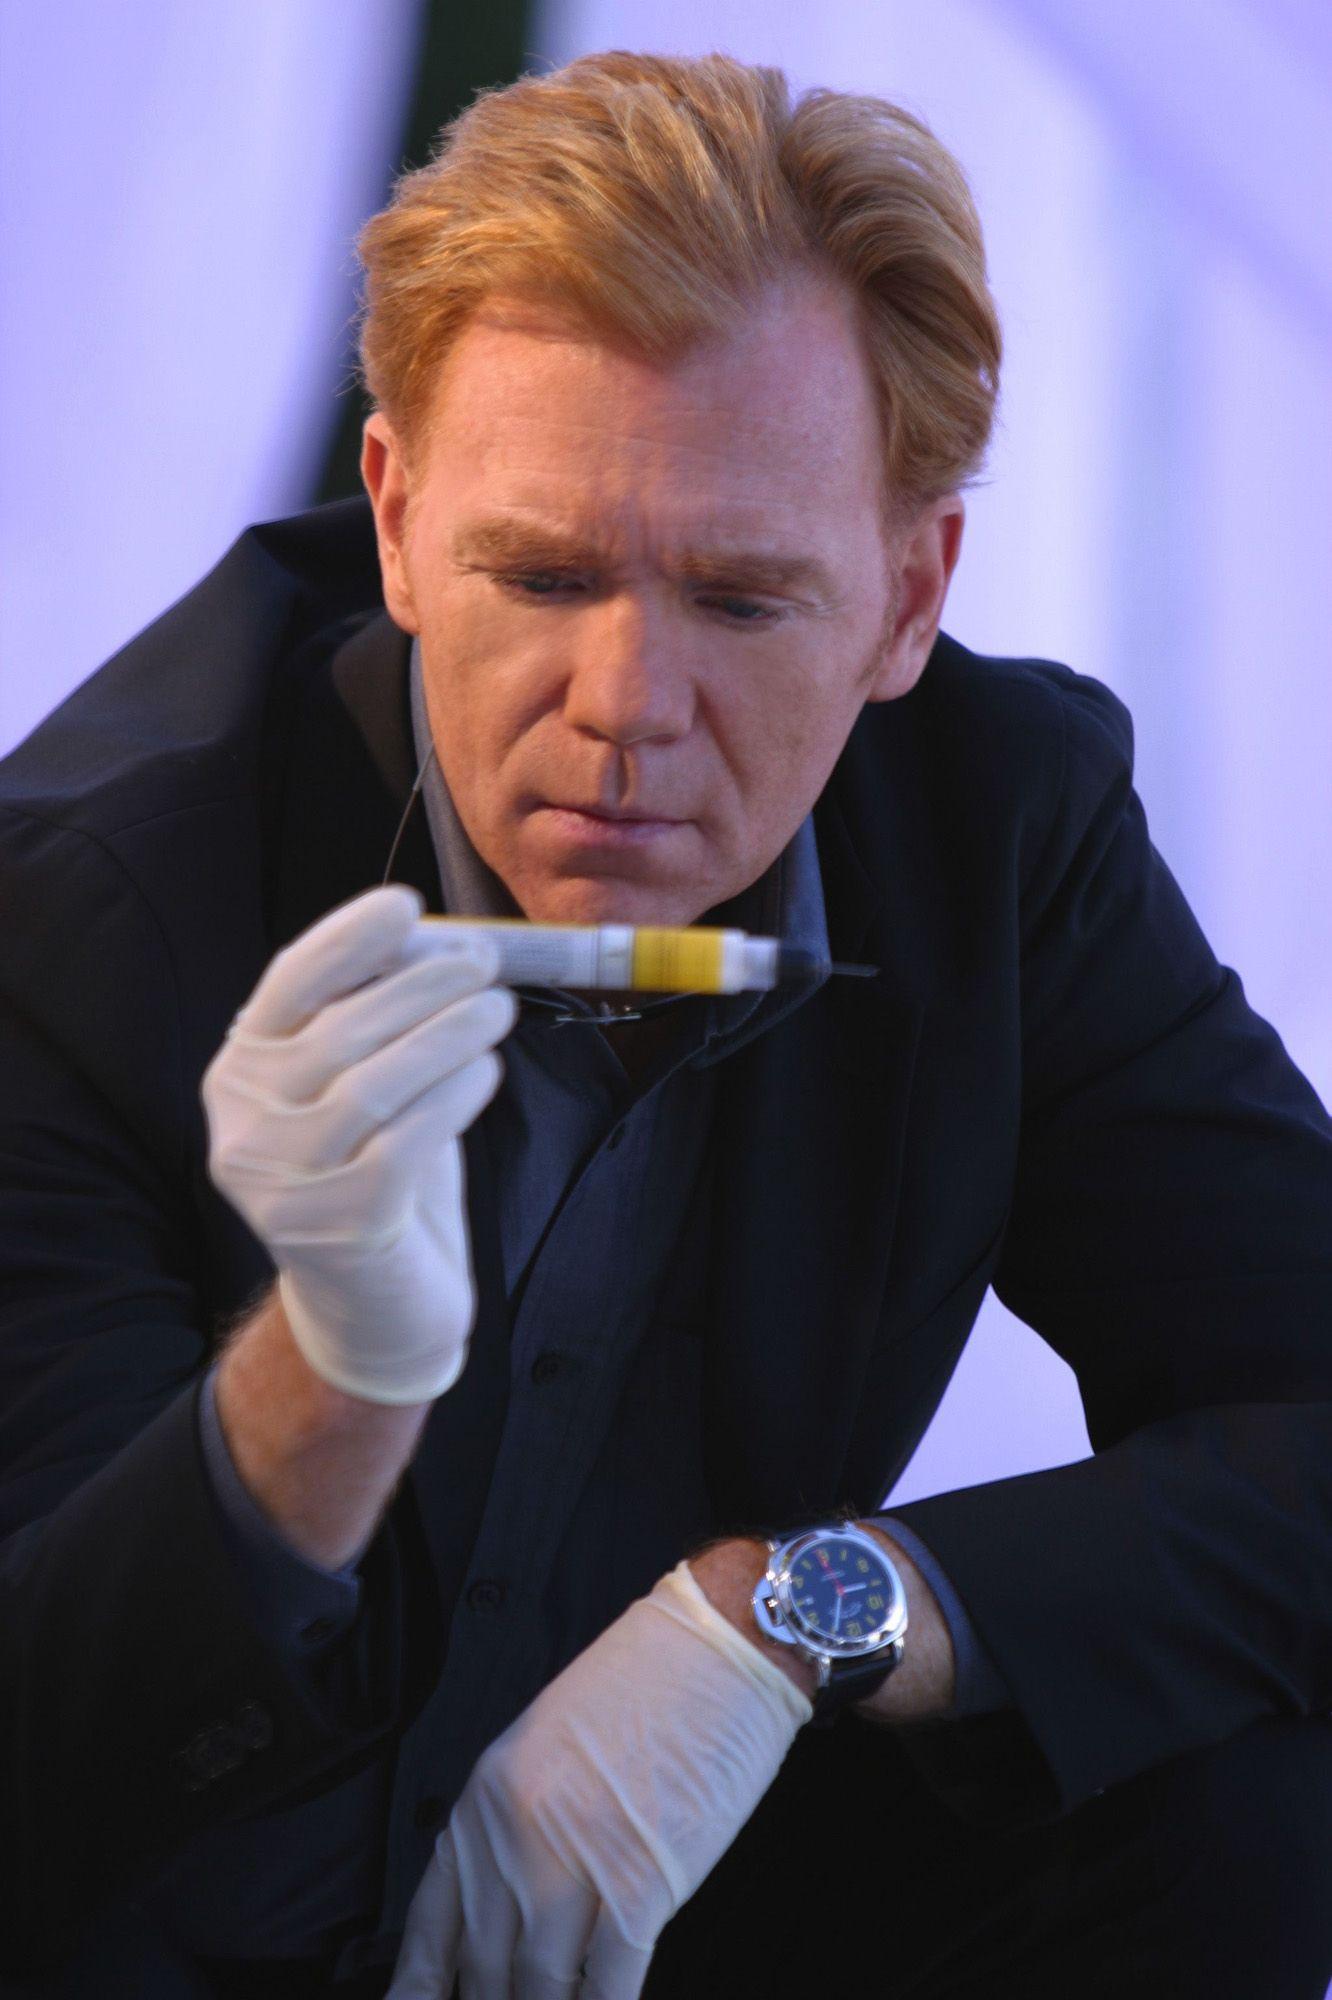 Pin By David Meneces On Tv Moderno: CSI: Miami Episode Still